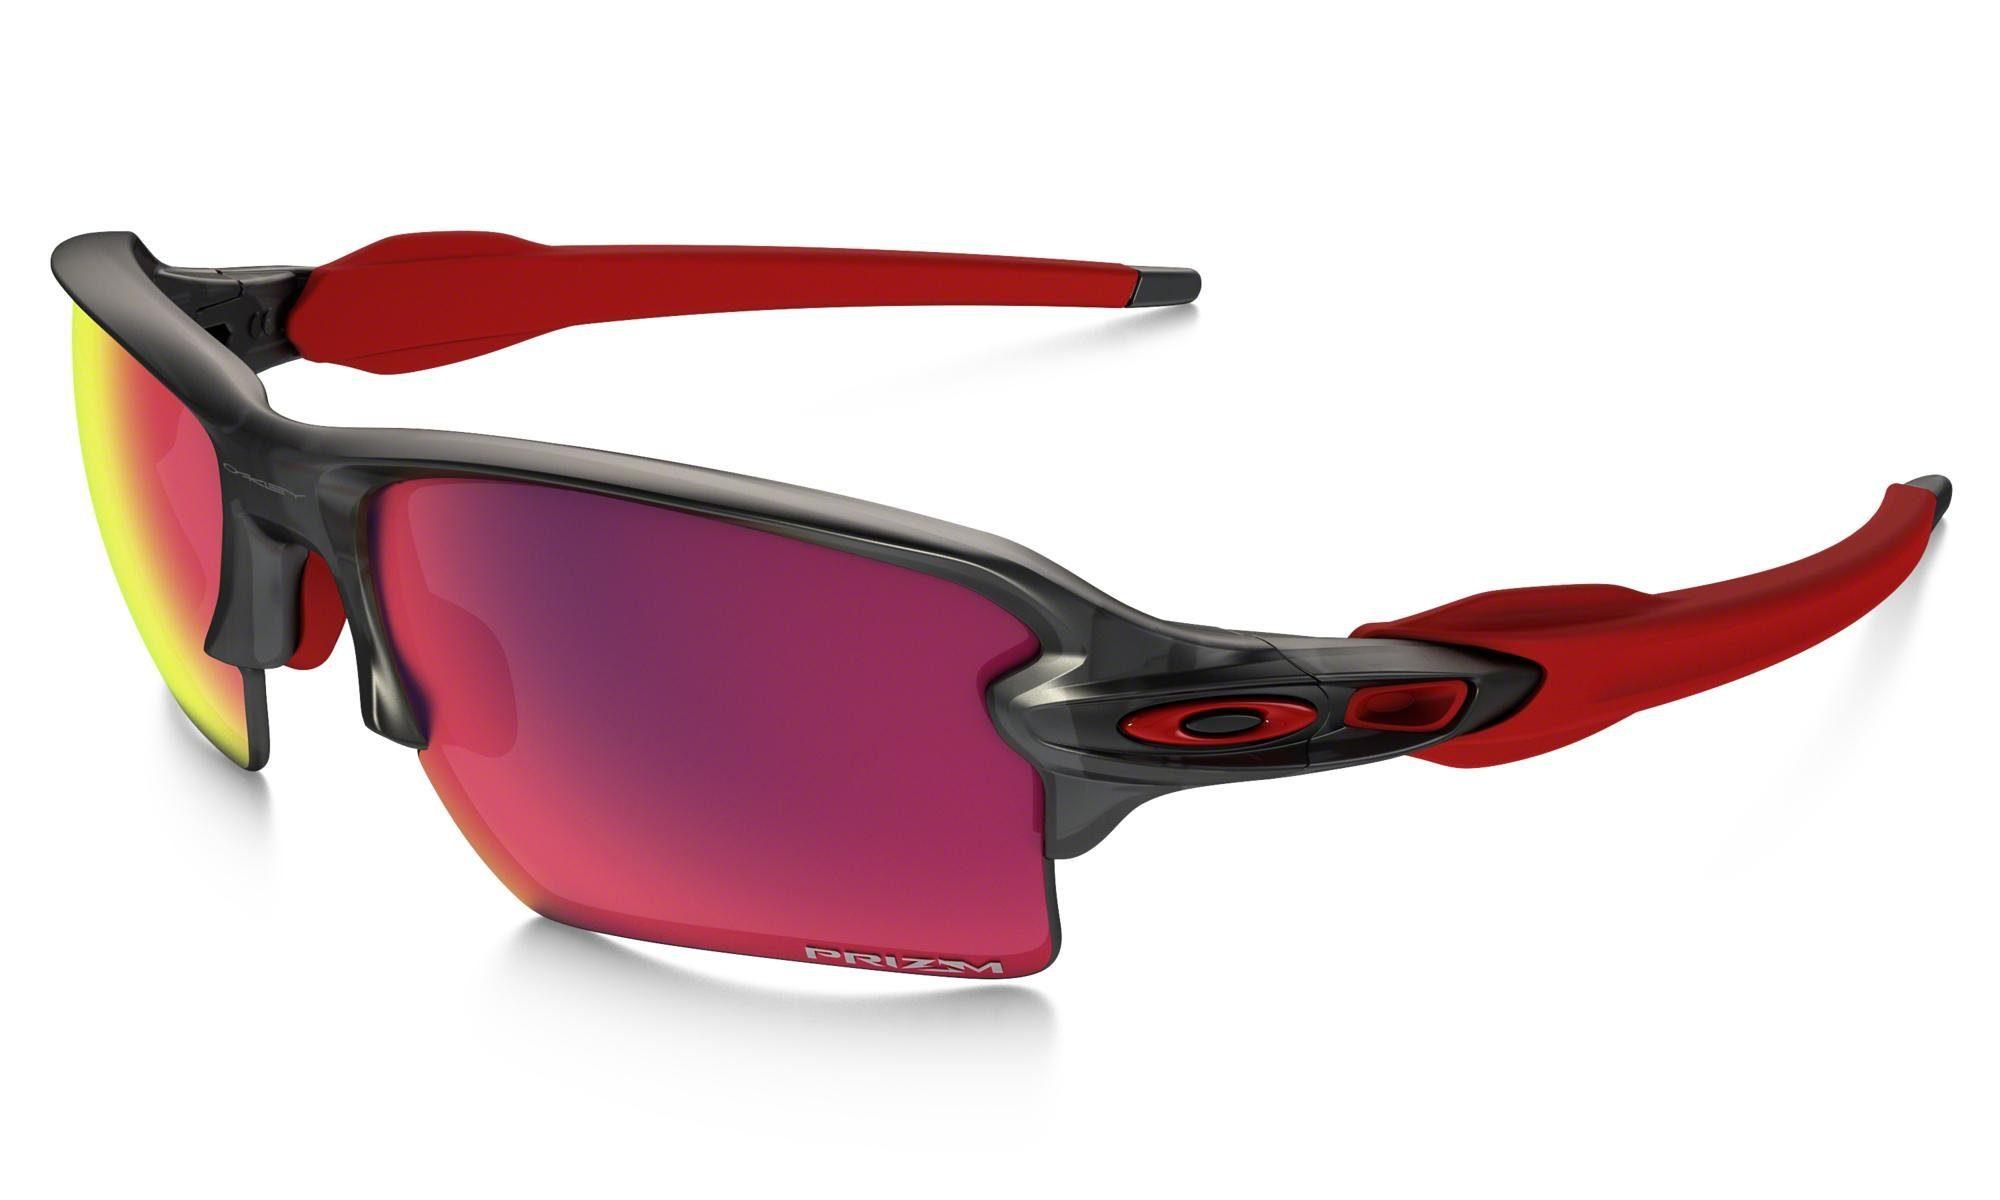 Oakley Radsportbrille »Prizm Road Flak 2.0 XL«